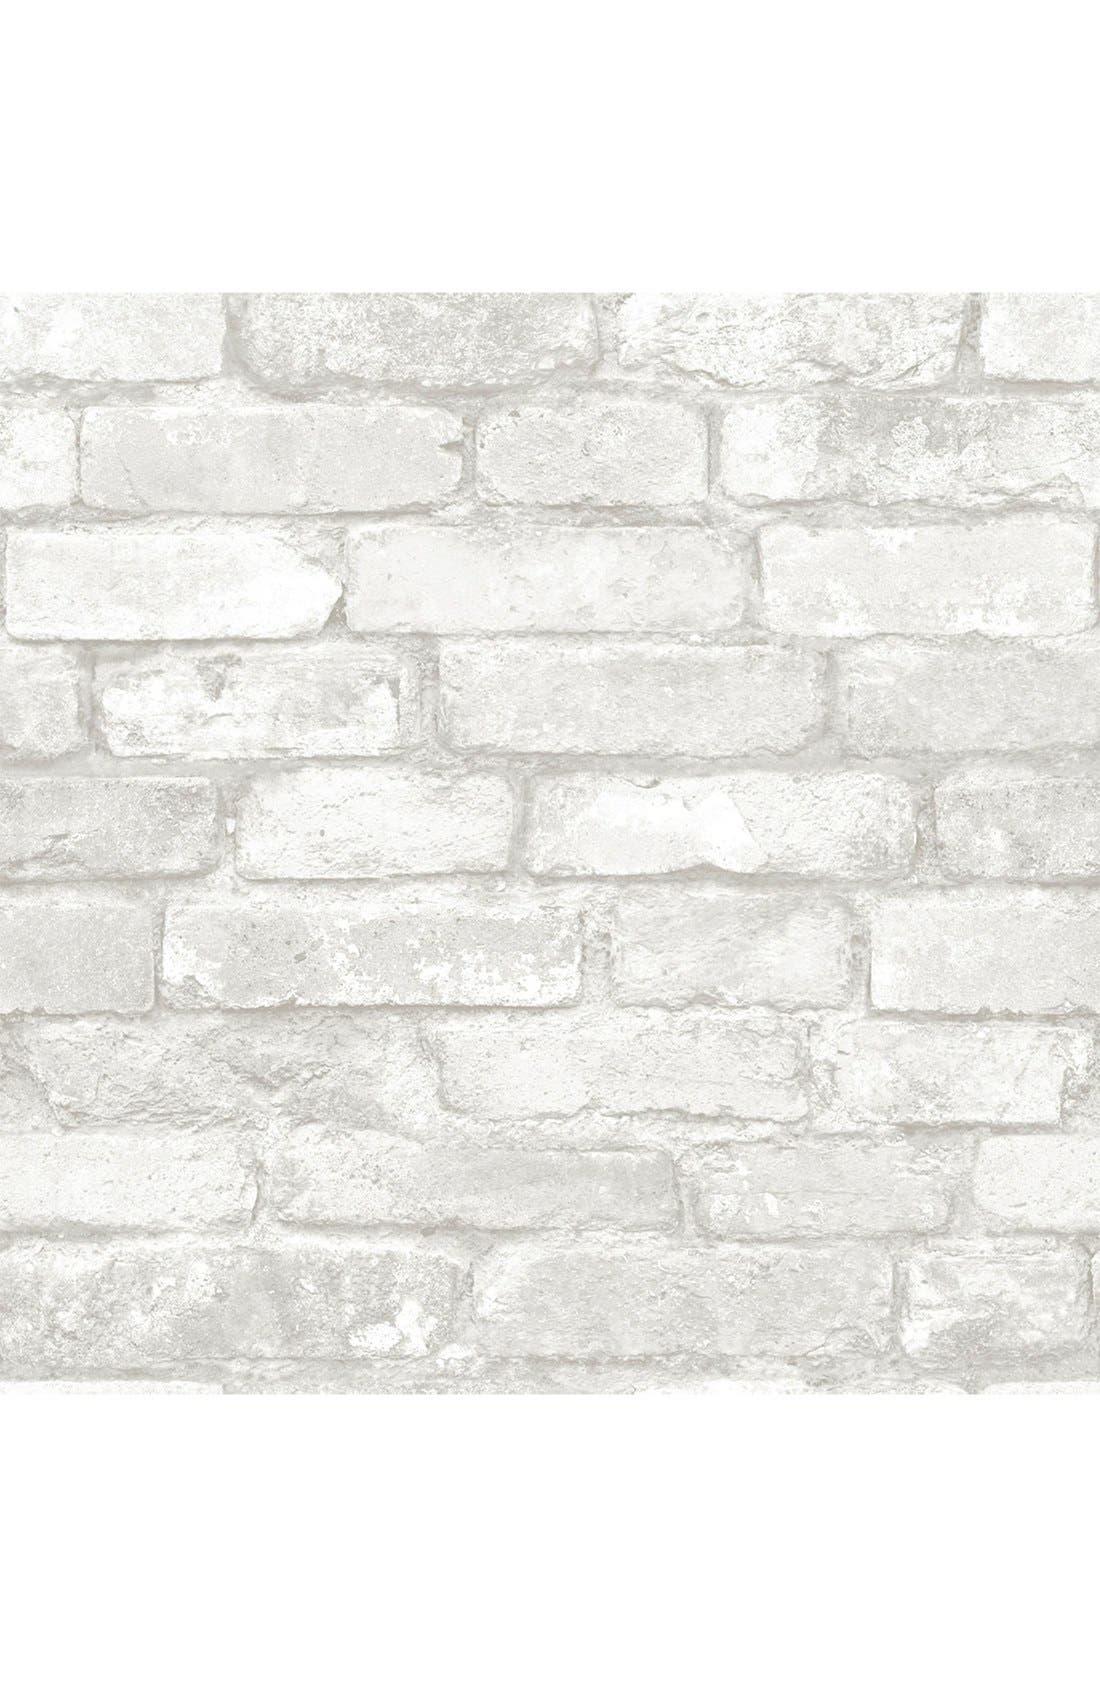 Alternate Image 1 Selected - Wallpops 'Grey & White Brick' Reusable Peel & Stick Vinyl Wallpaper